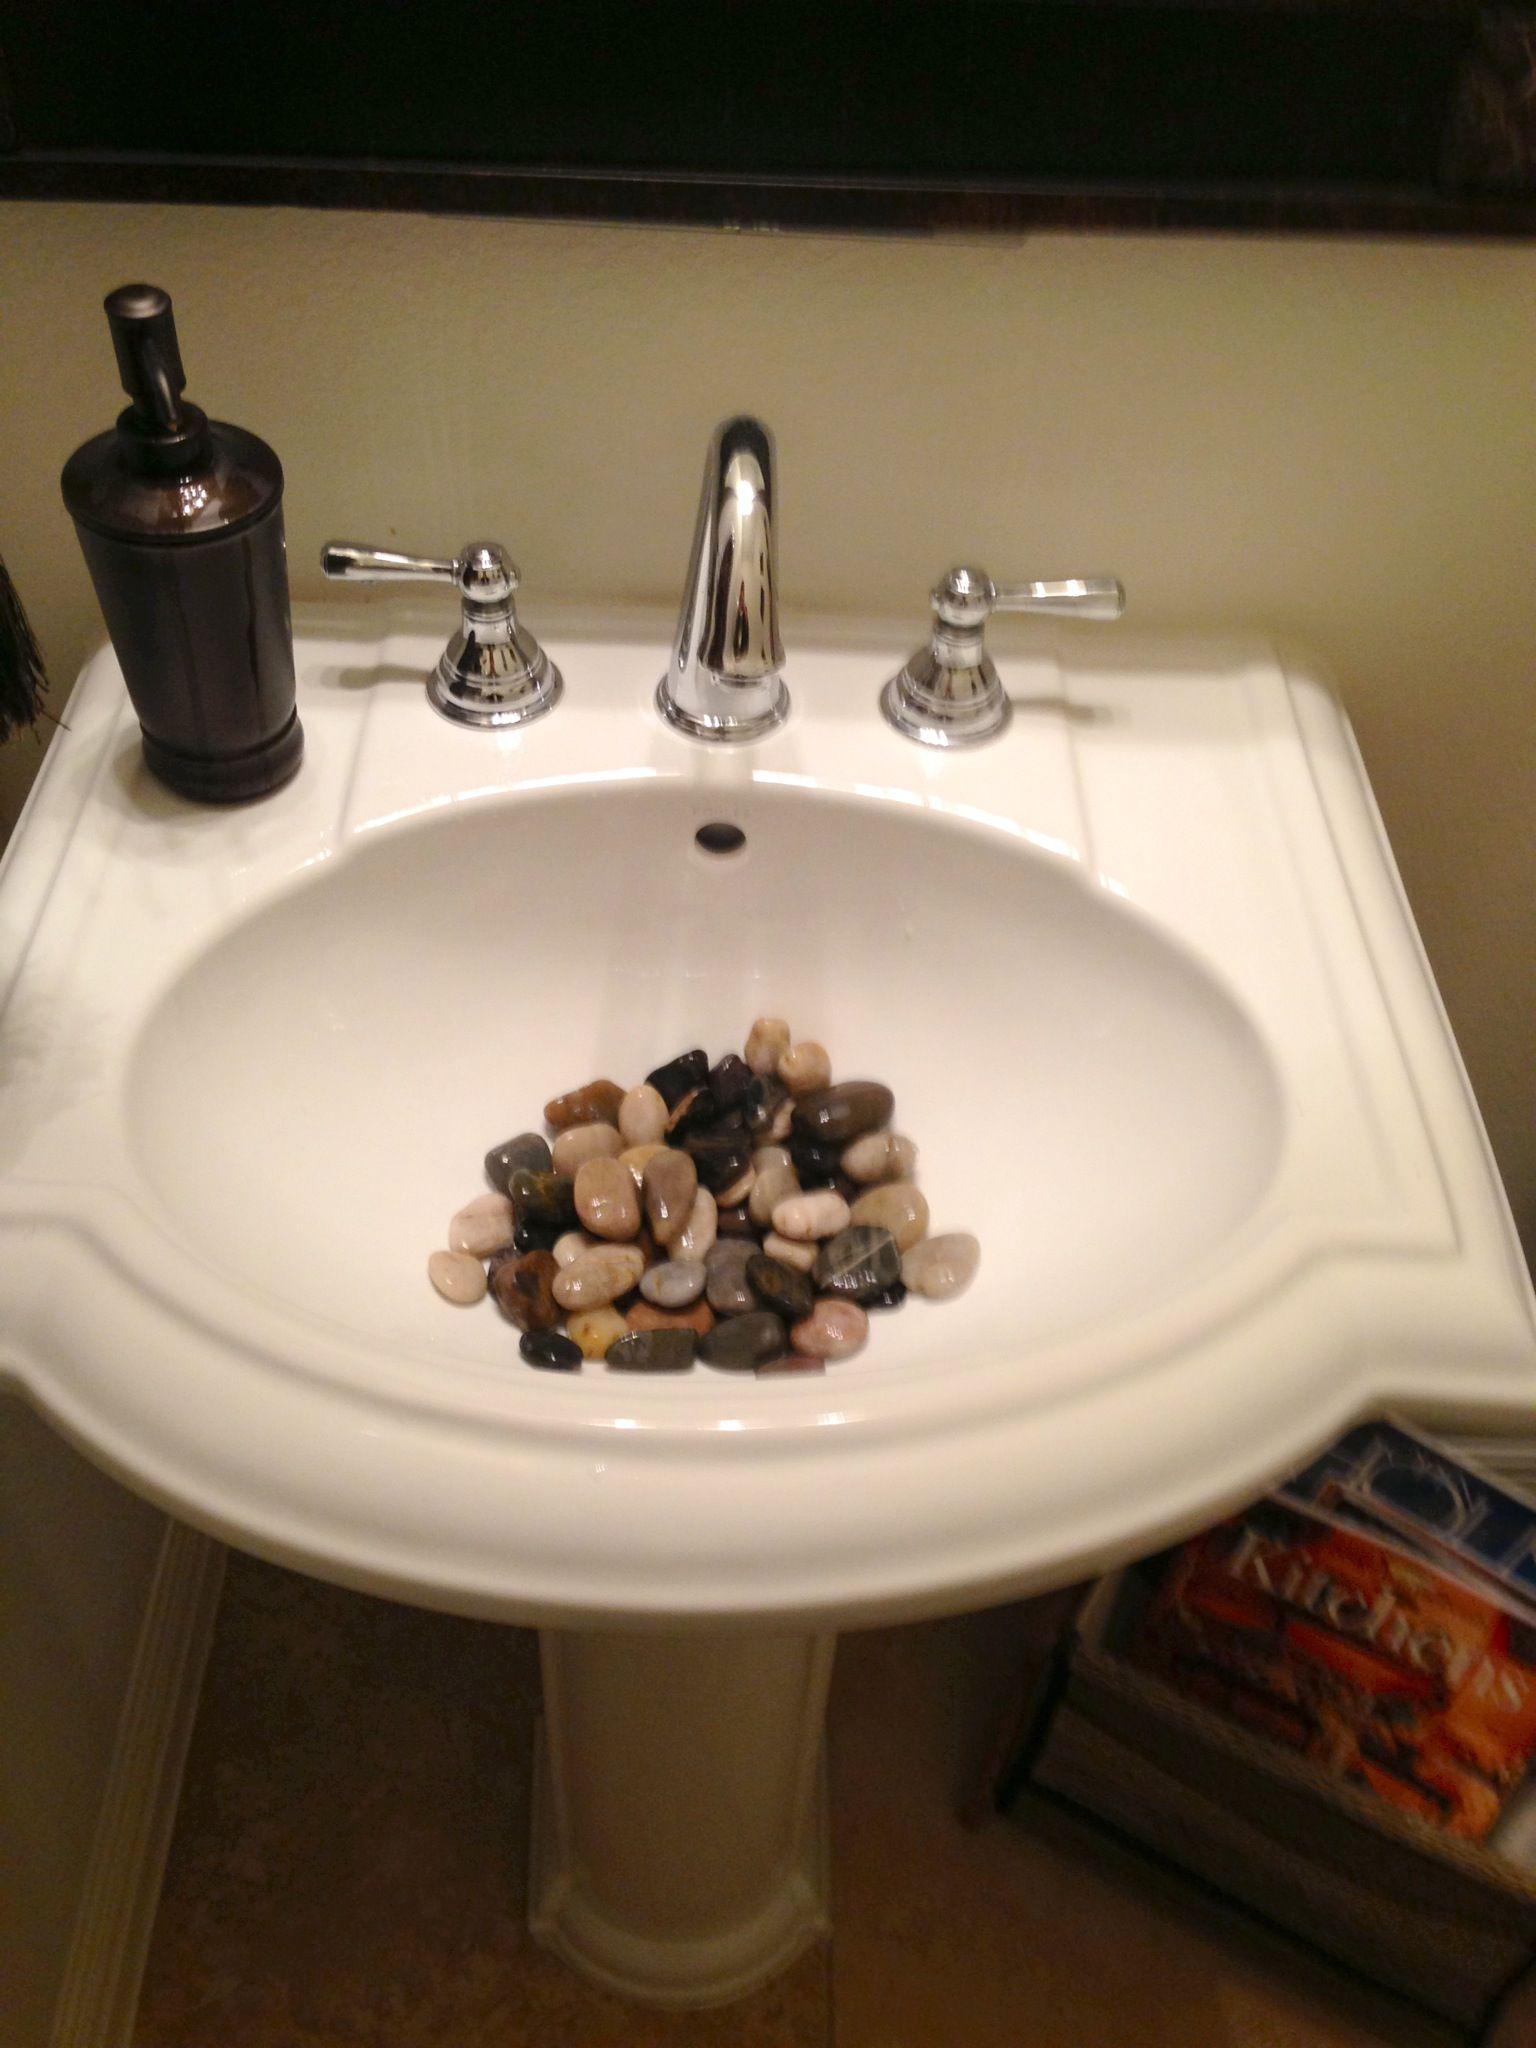 River Rocks In Bathroom Sink